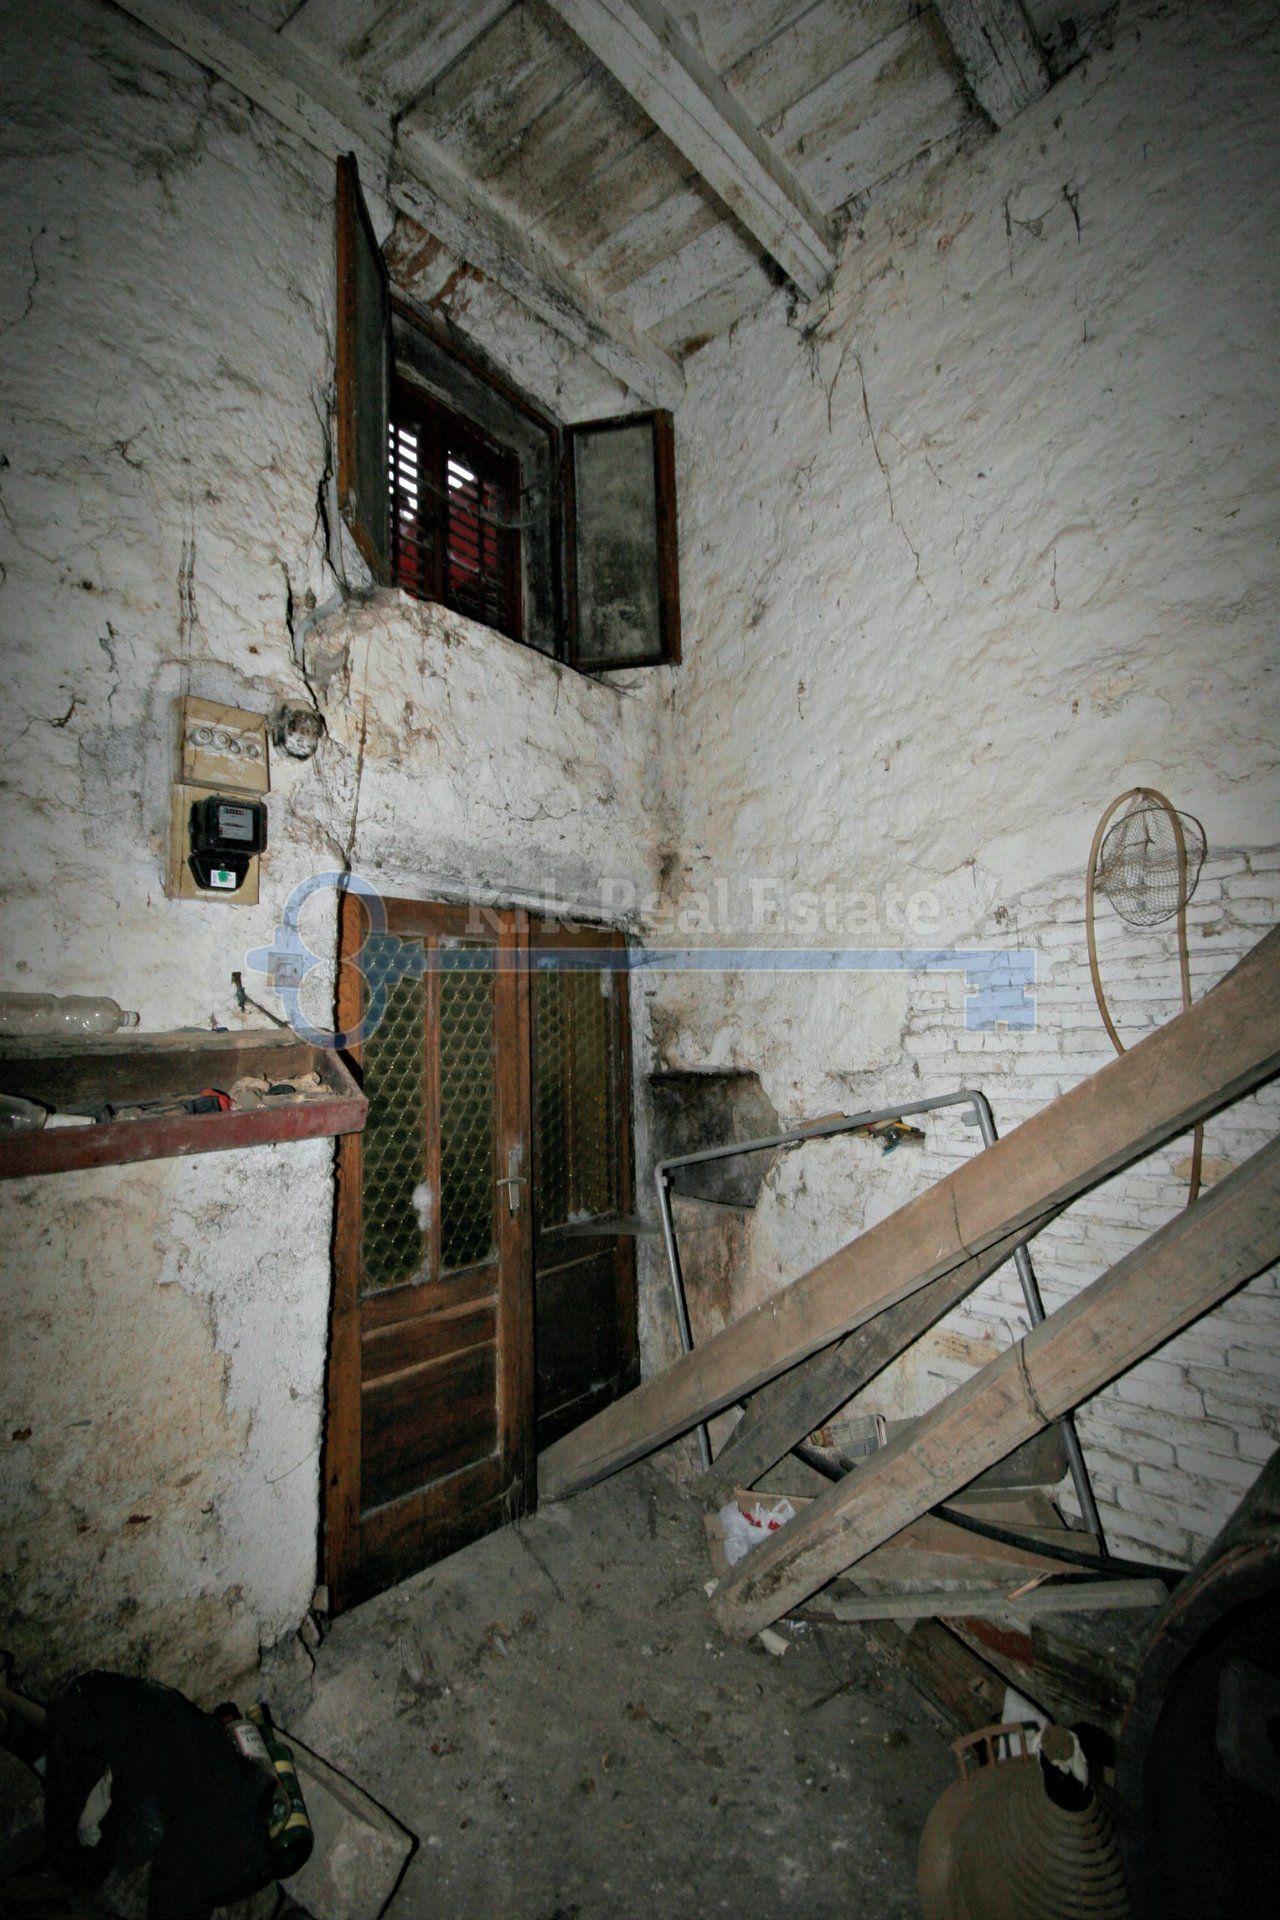 OTOK KRK - KRK - LOKAL U STAROJ JEZGRI GRADA